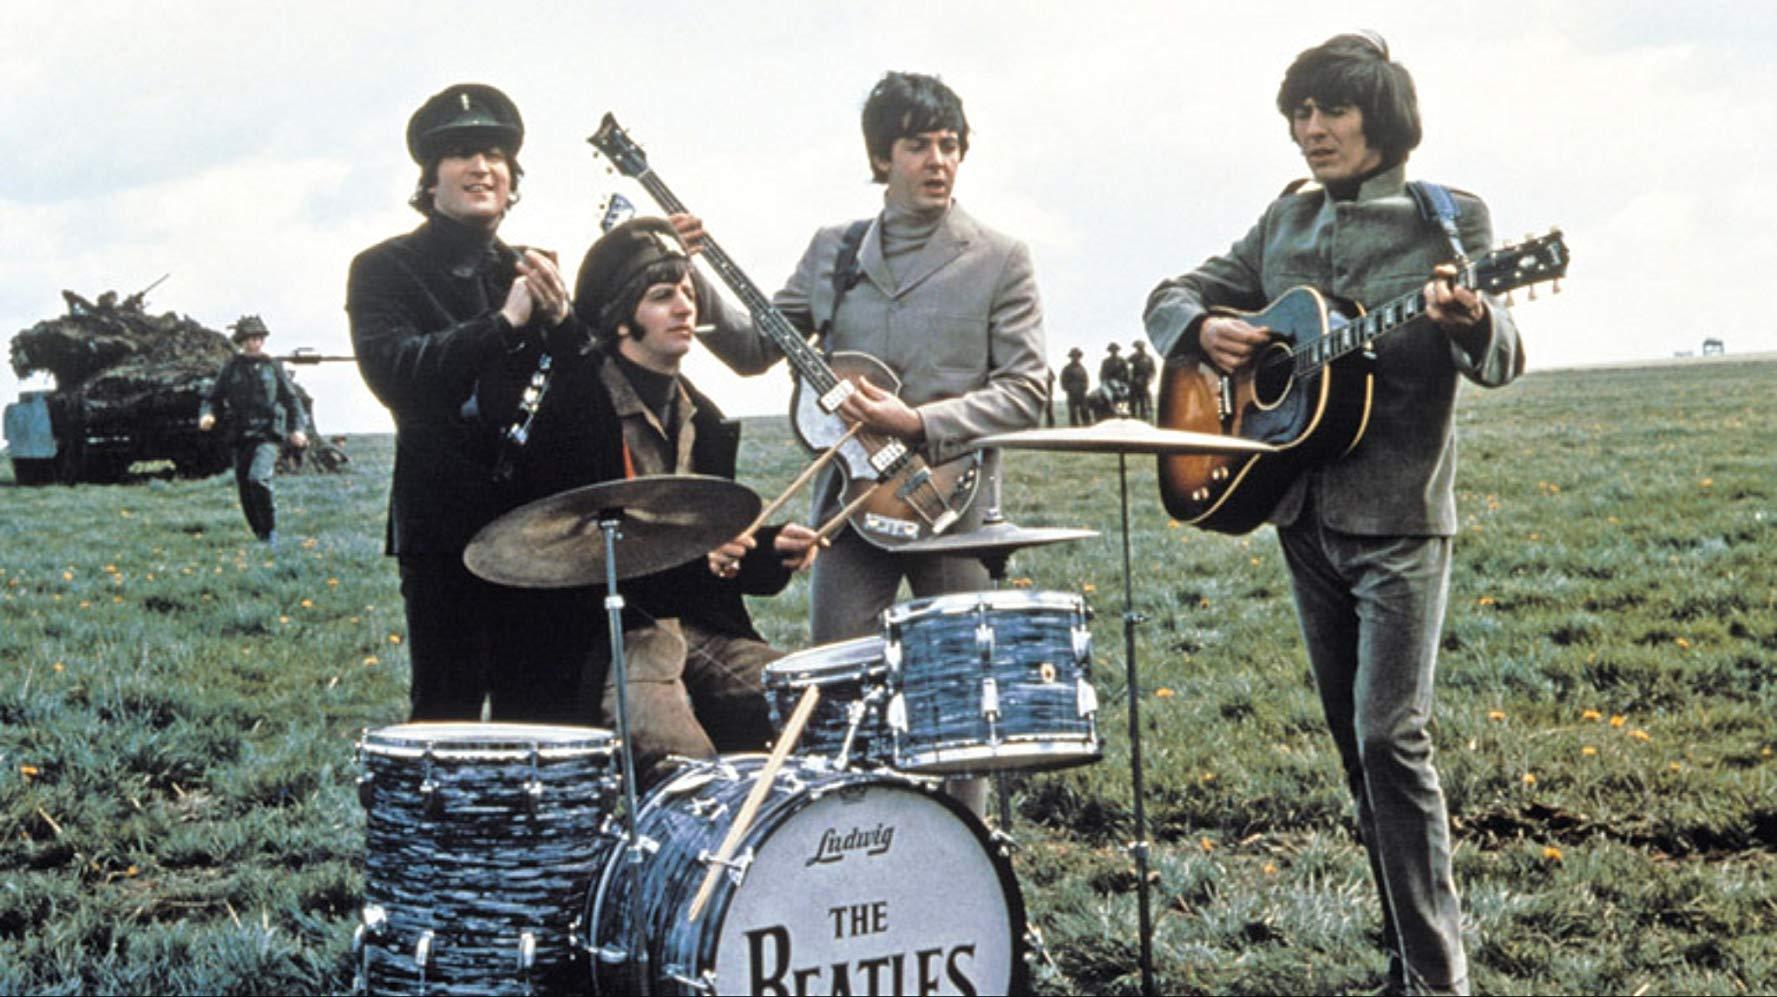 The Beatles - John Lennon, Ringo Starr, Paul McCartney and George Harrison - in Help (1965)